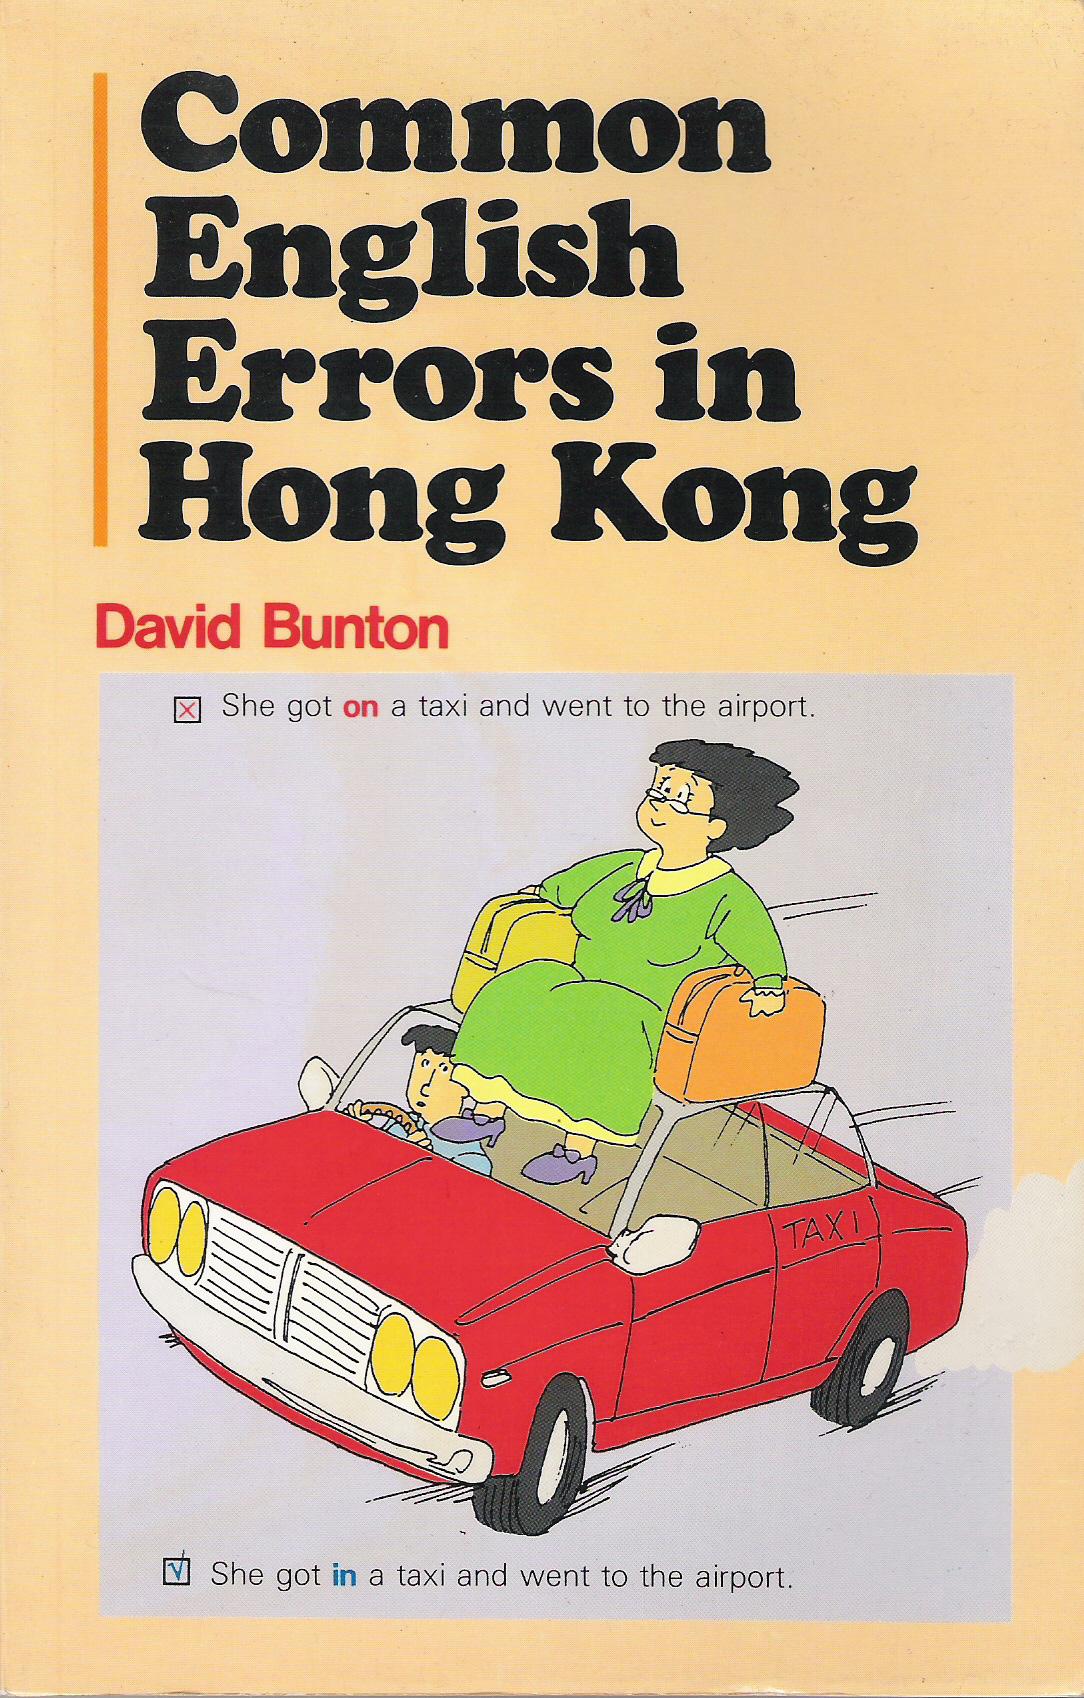 Common English Errors in Hong Kong